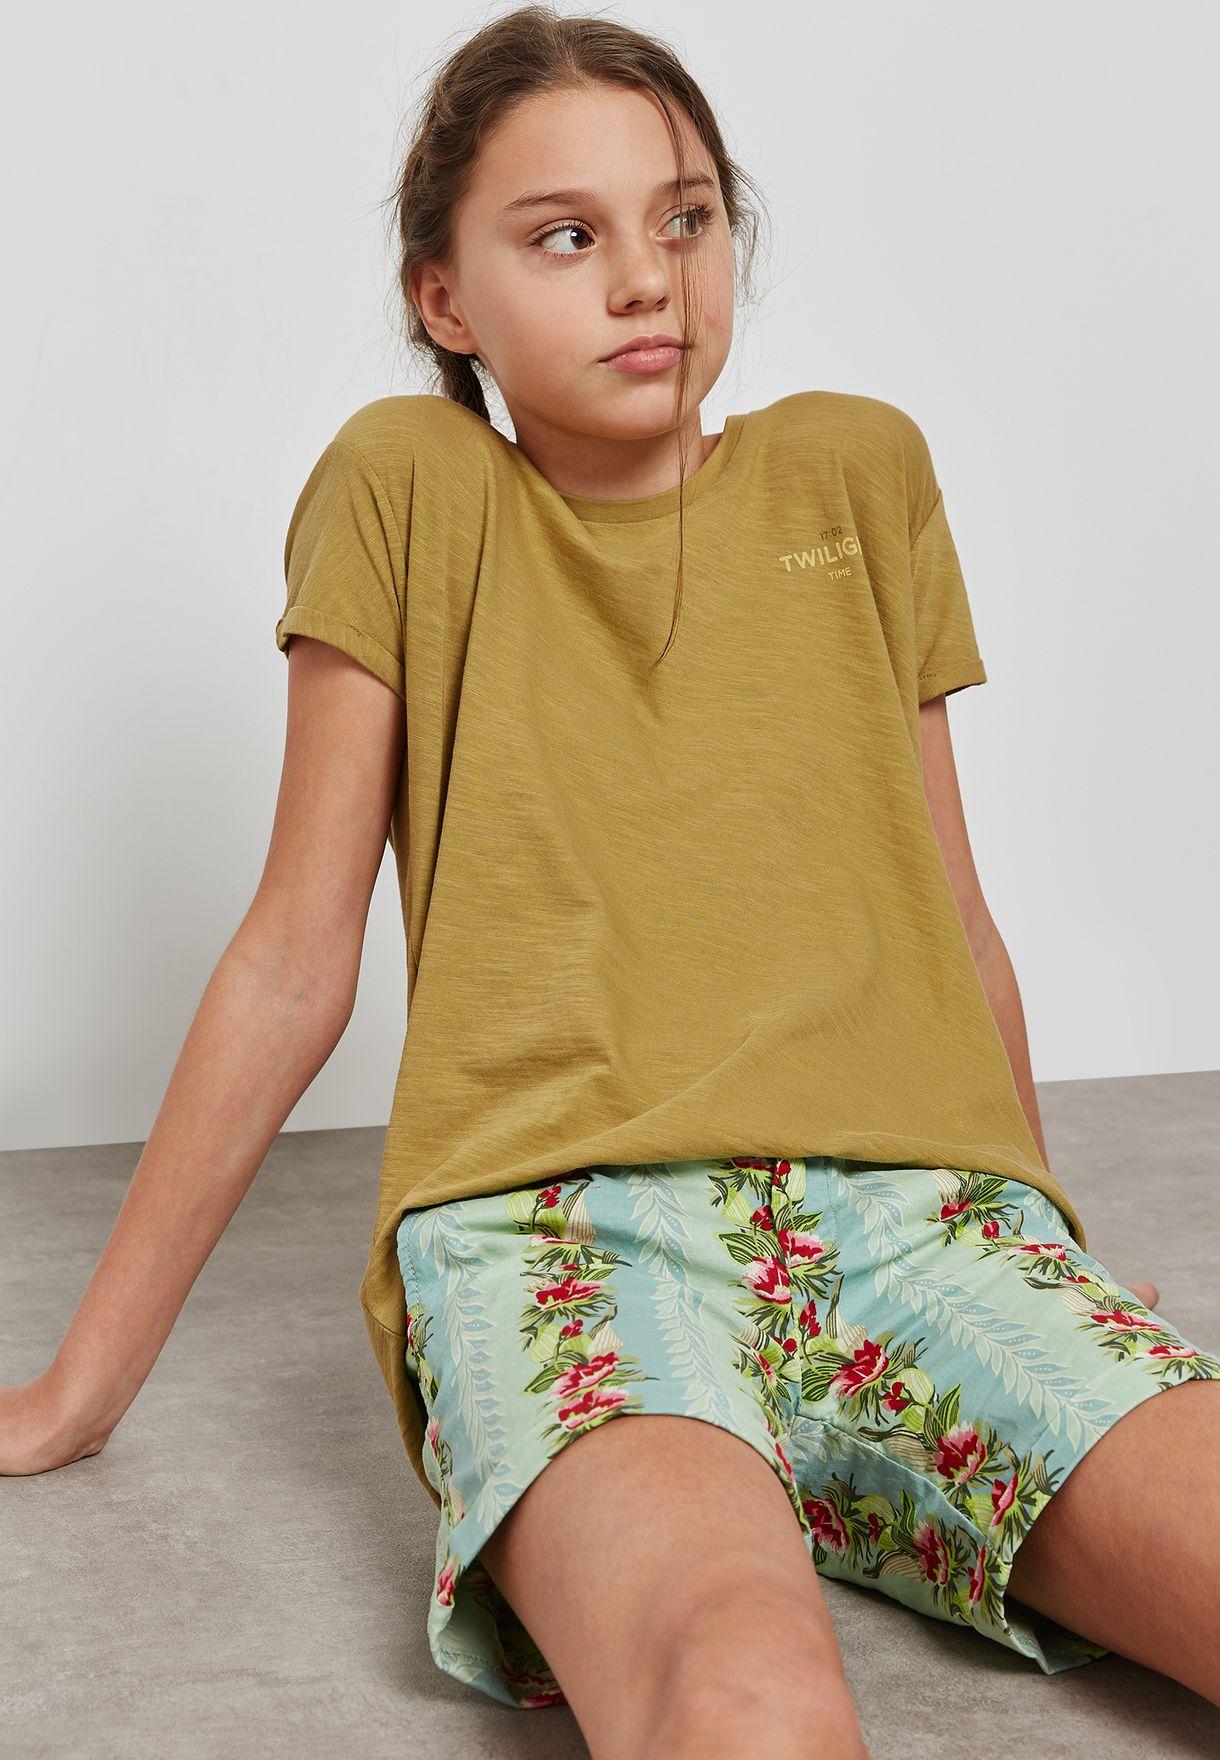 Teen Twilight T-Shirt